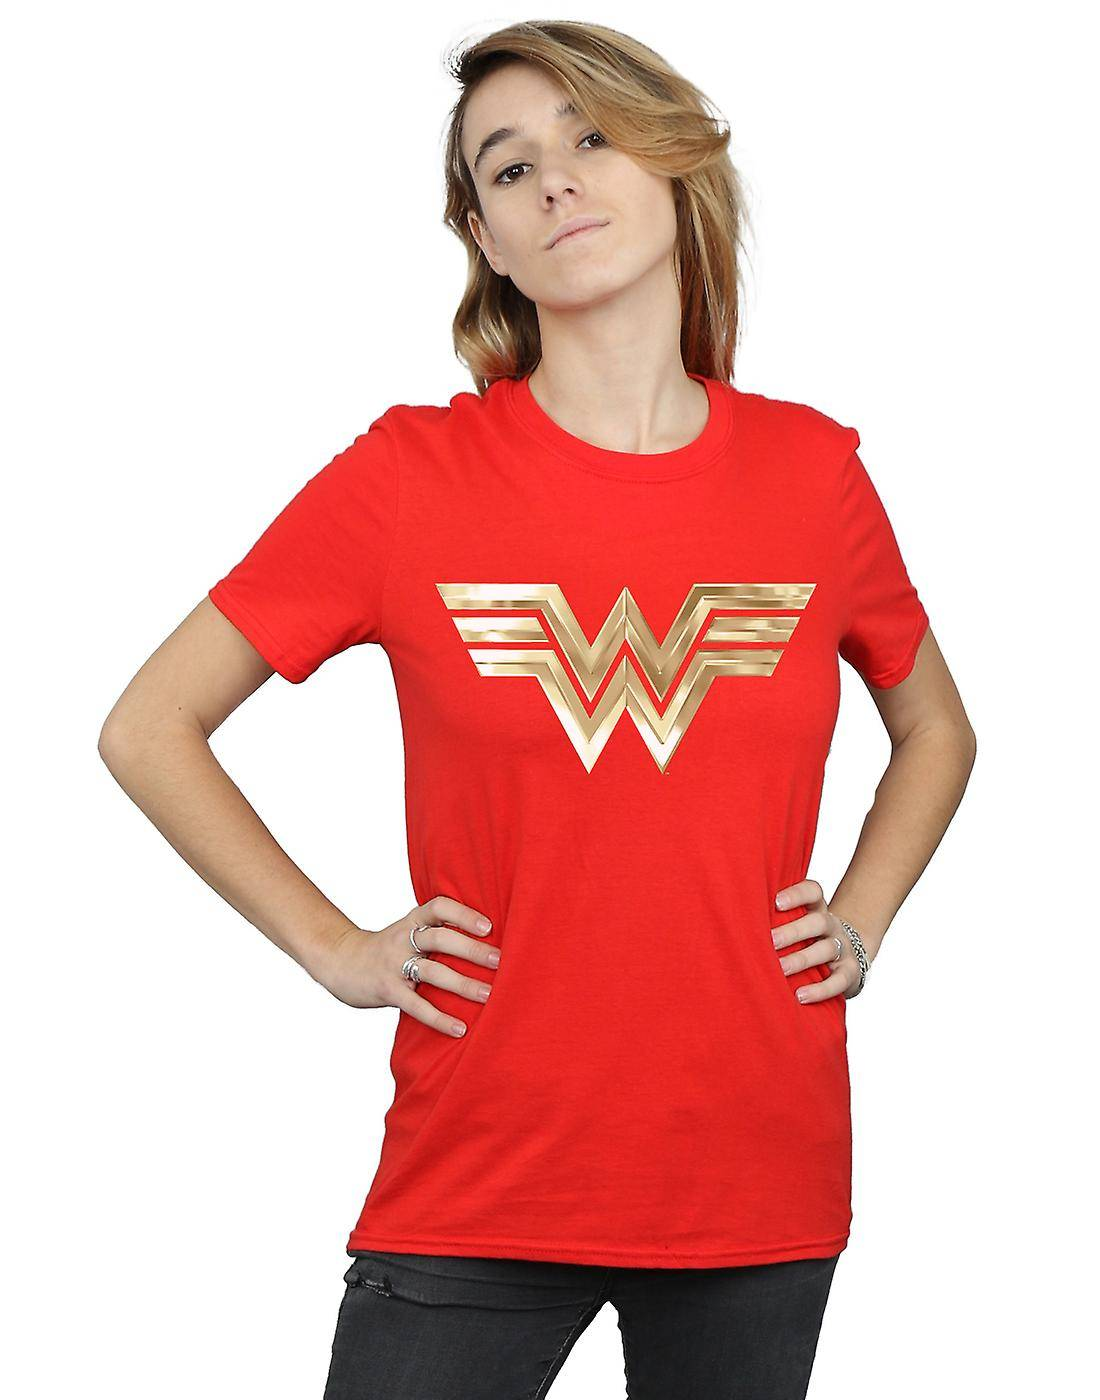 Absolute Cult DC Comics Femmes-apos;s Wonder Woman 84 Gold Emblem Boyfriend Fit T-Shirt Blanc XXXX-Large